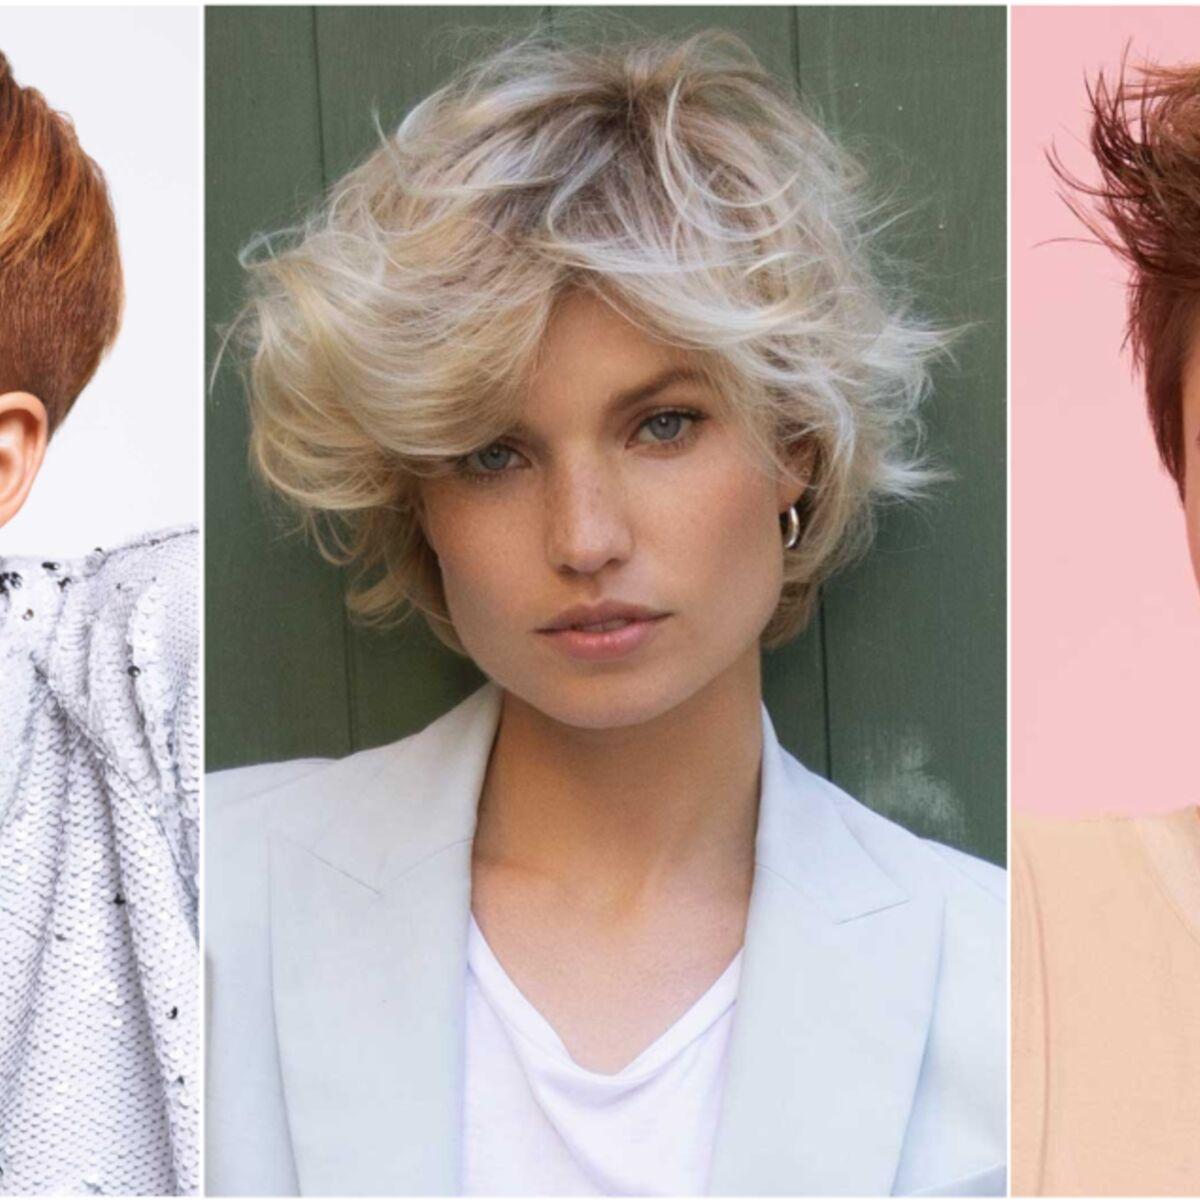 20 Colorations Pour Cheveux Courts A Adopter Absolument Femme Actuelle Le Mag